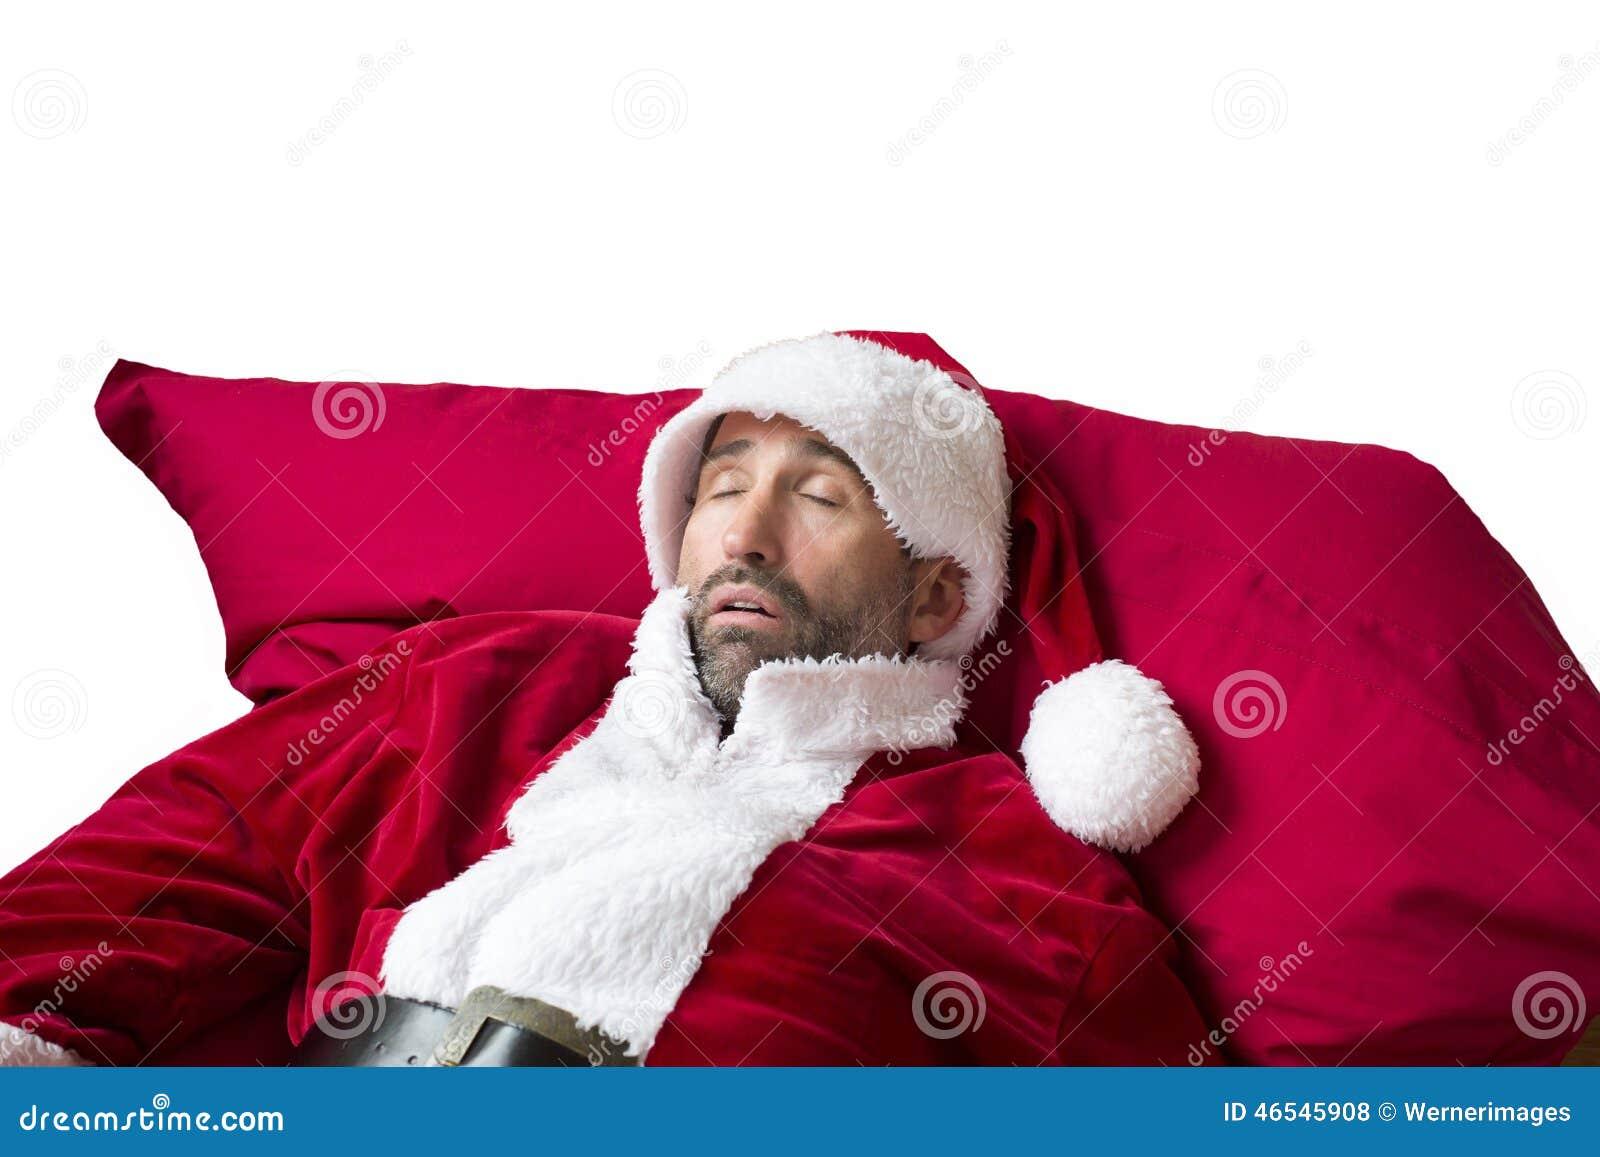 Santa Claus Sleeping Stock Photo. Image Of Beard, Concept